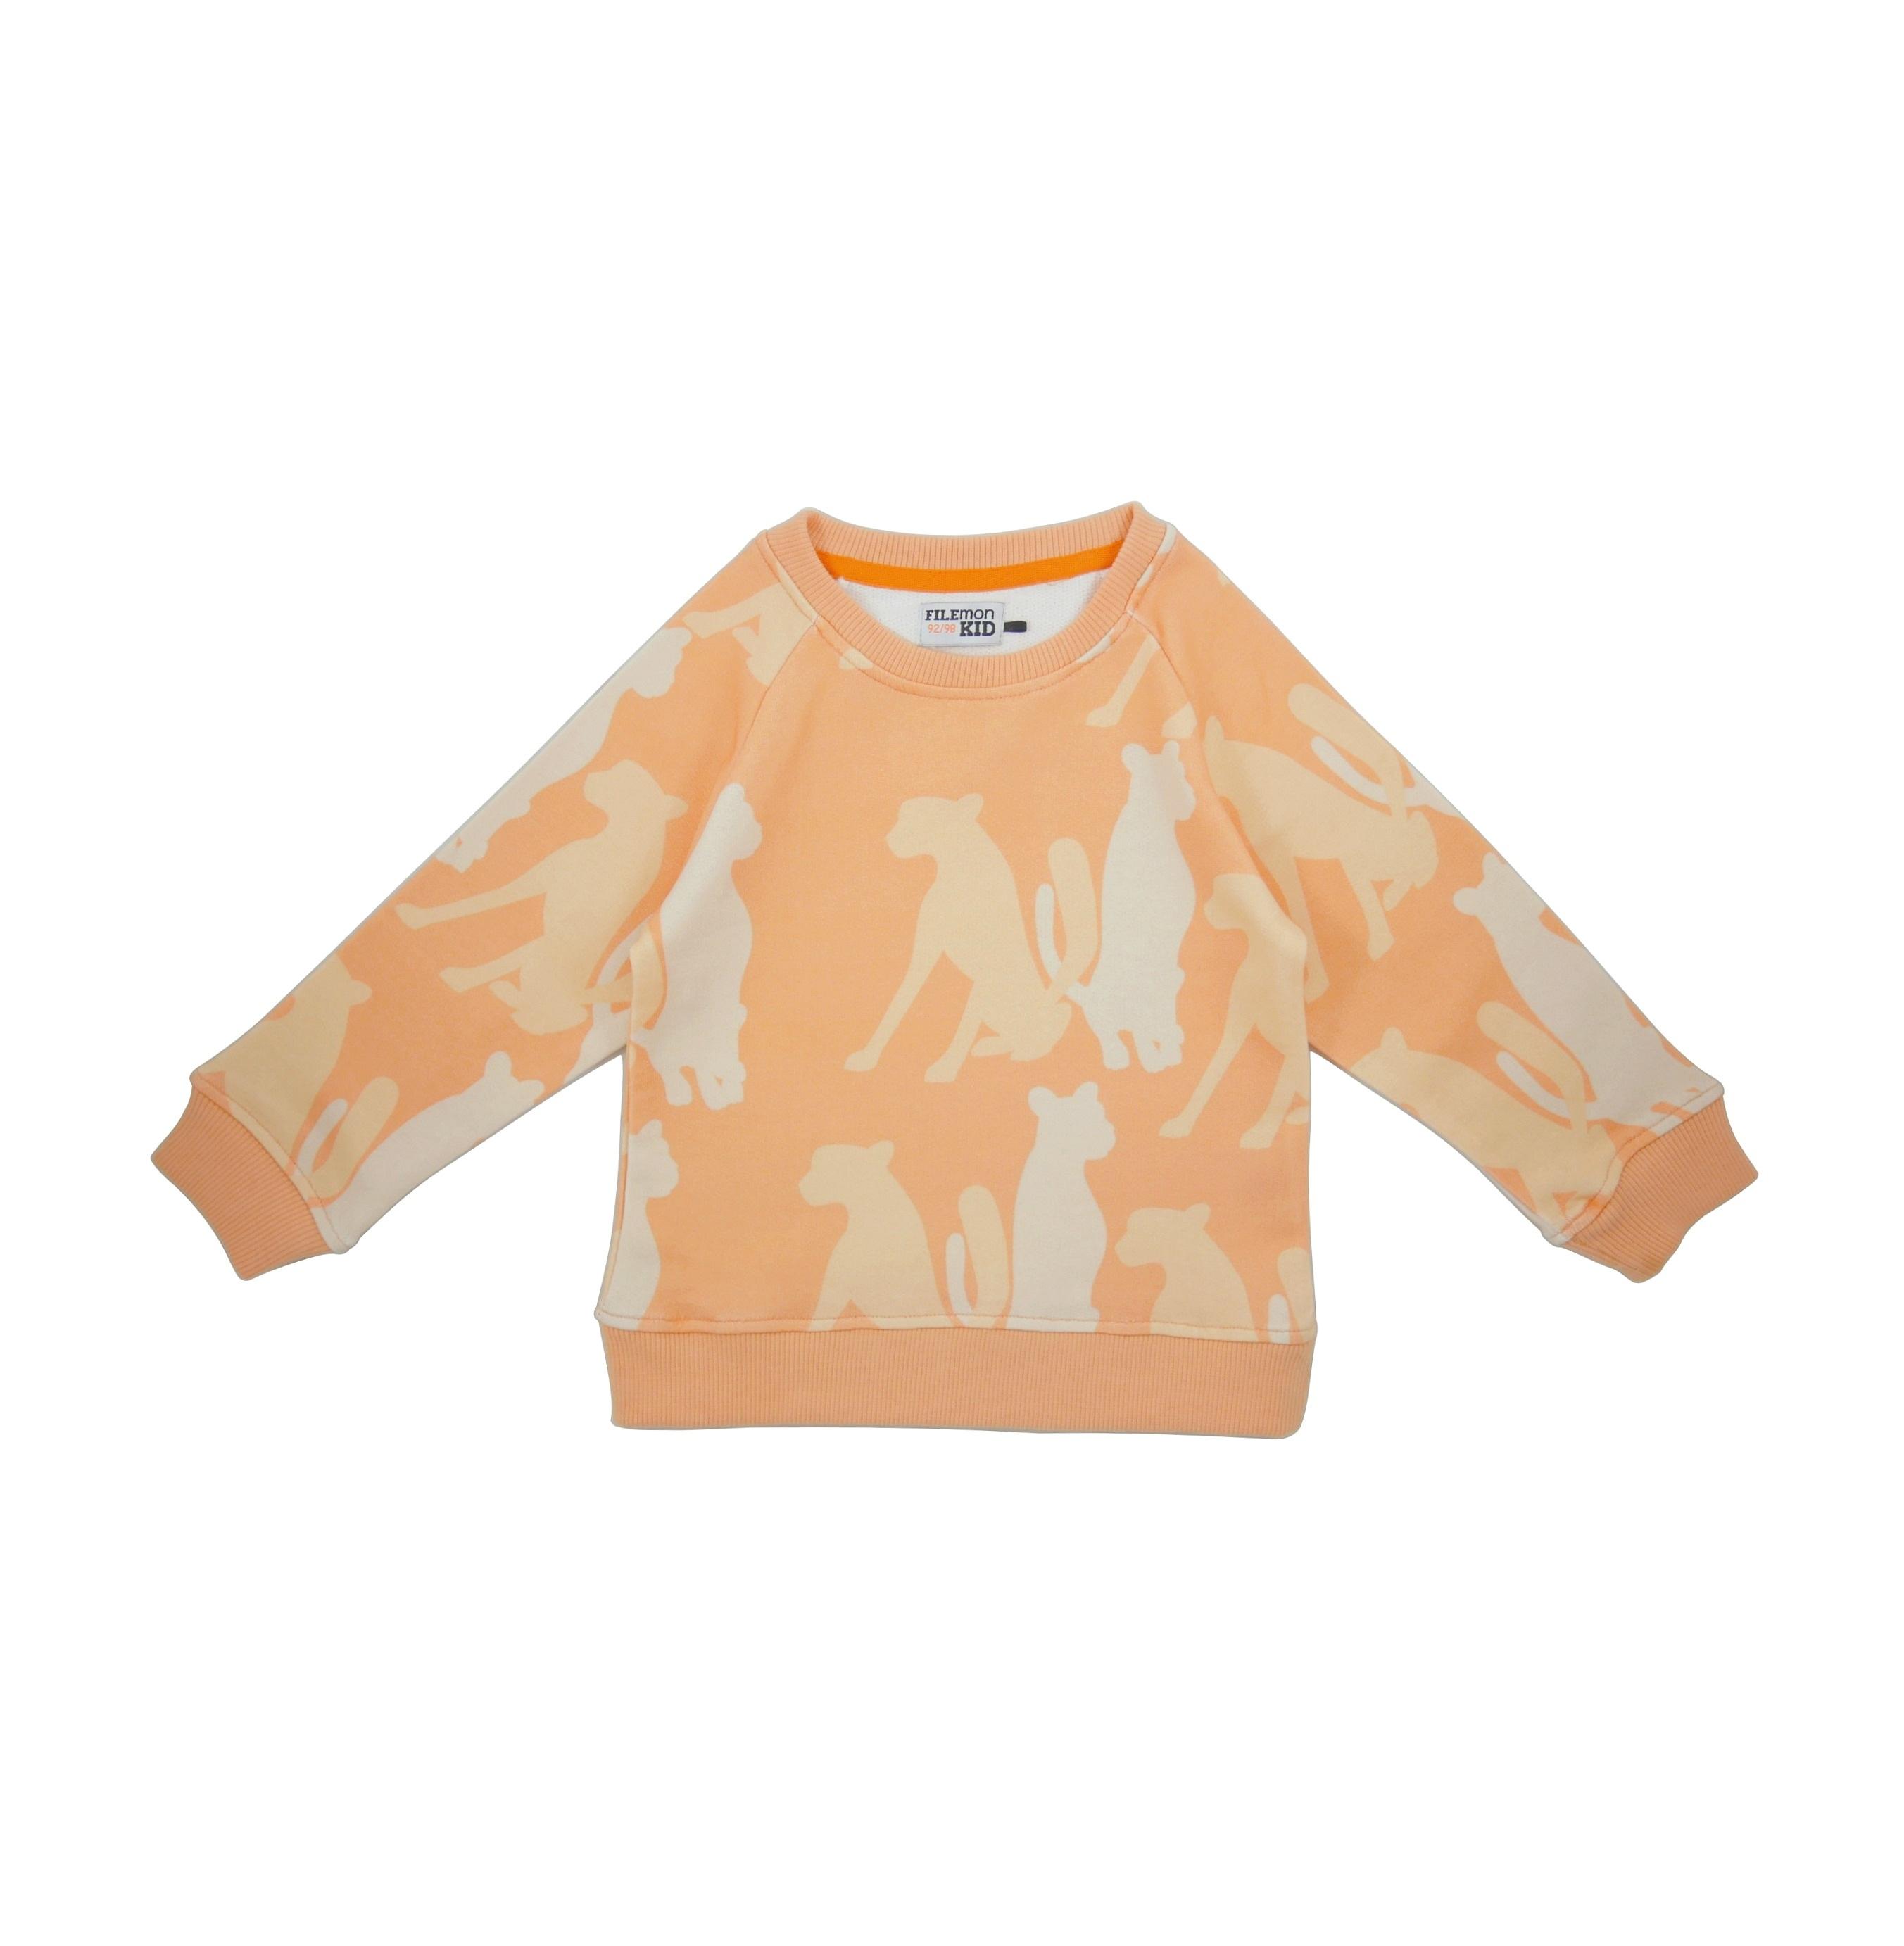 19SSSS Sweatshirt Cheetah Silouette